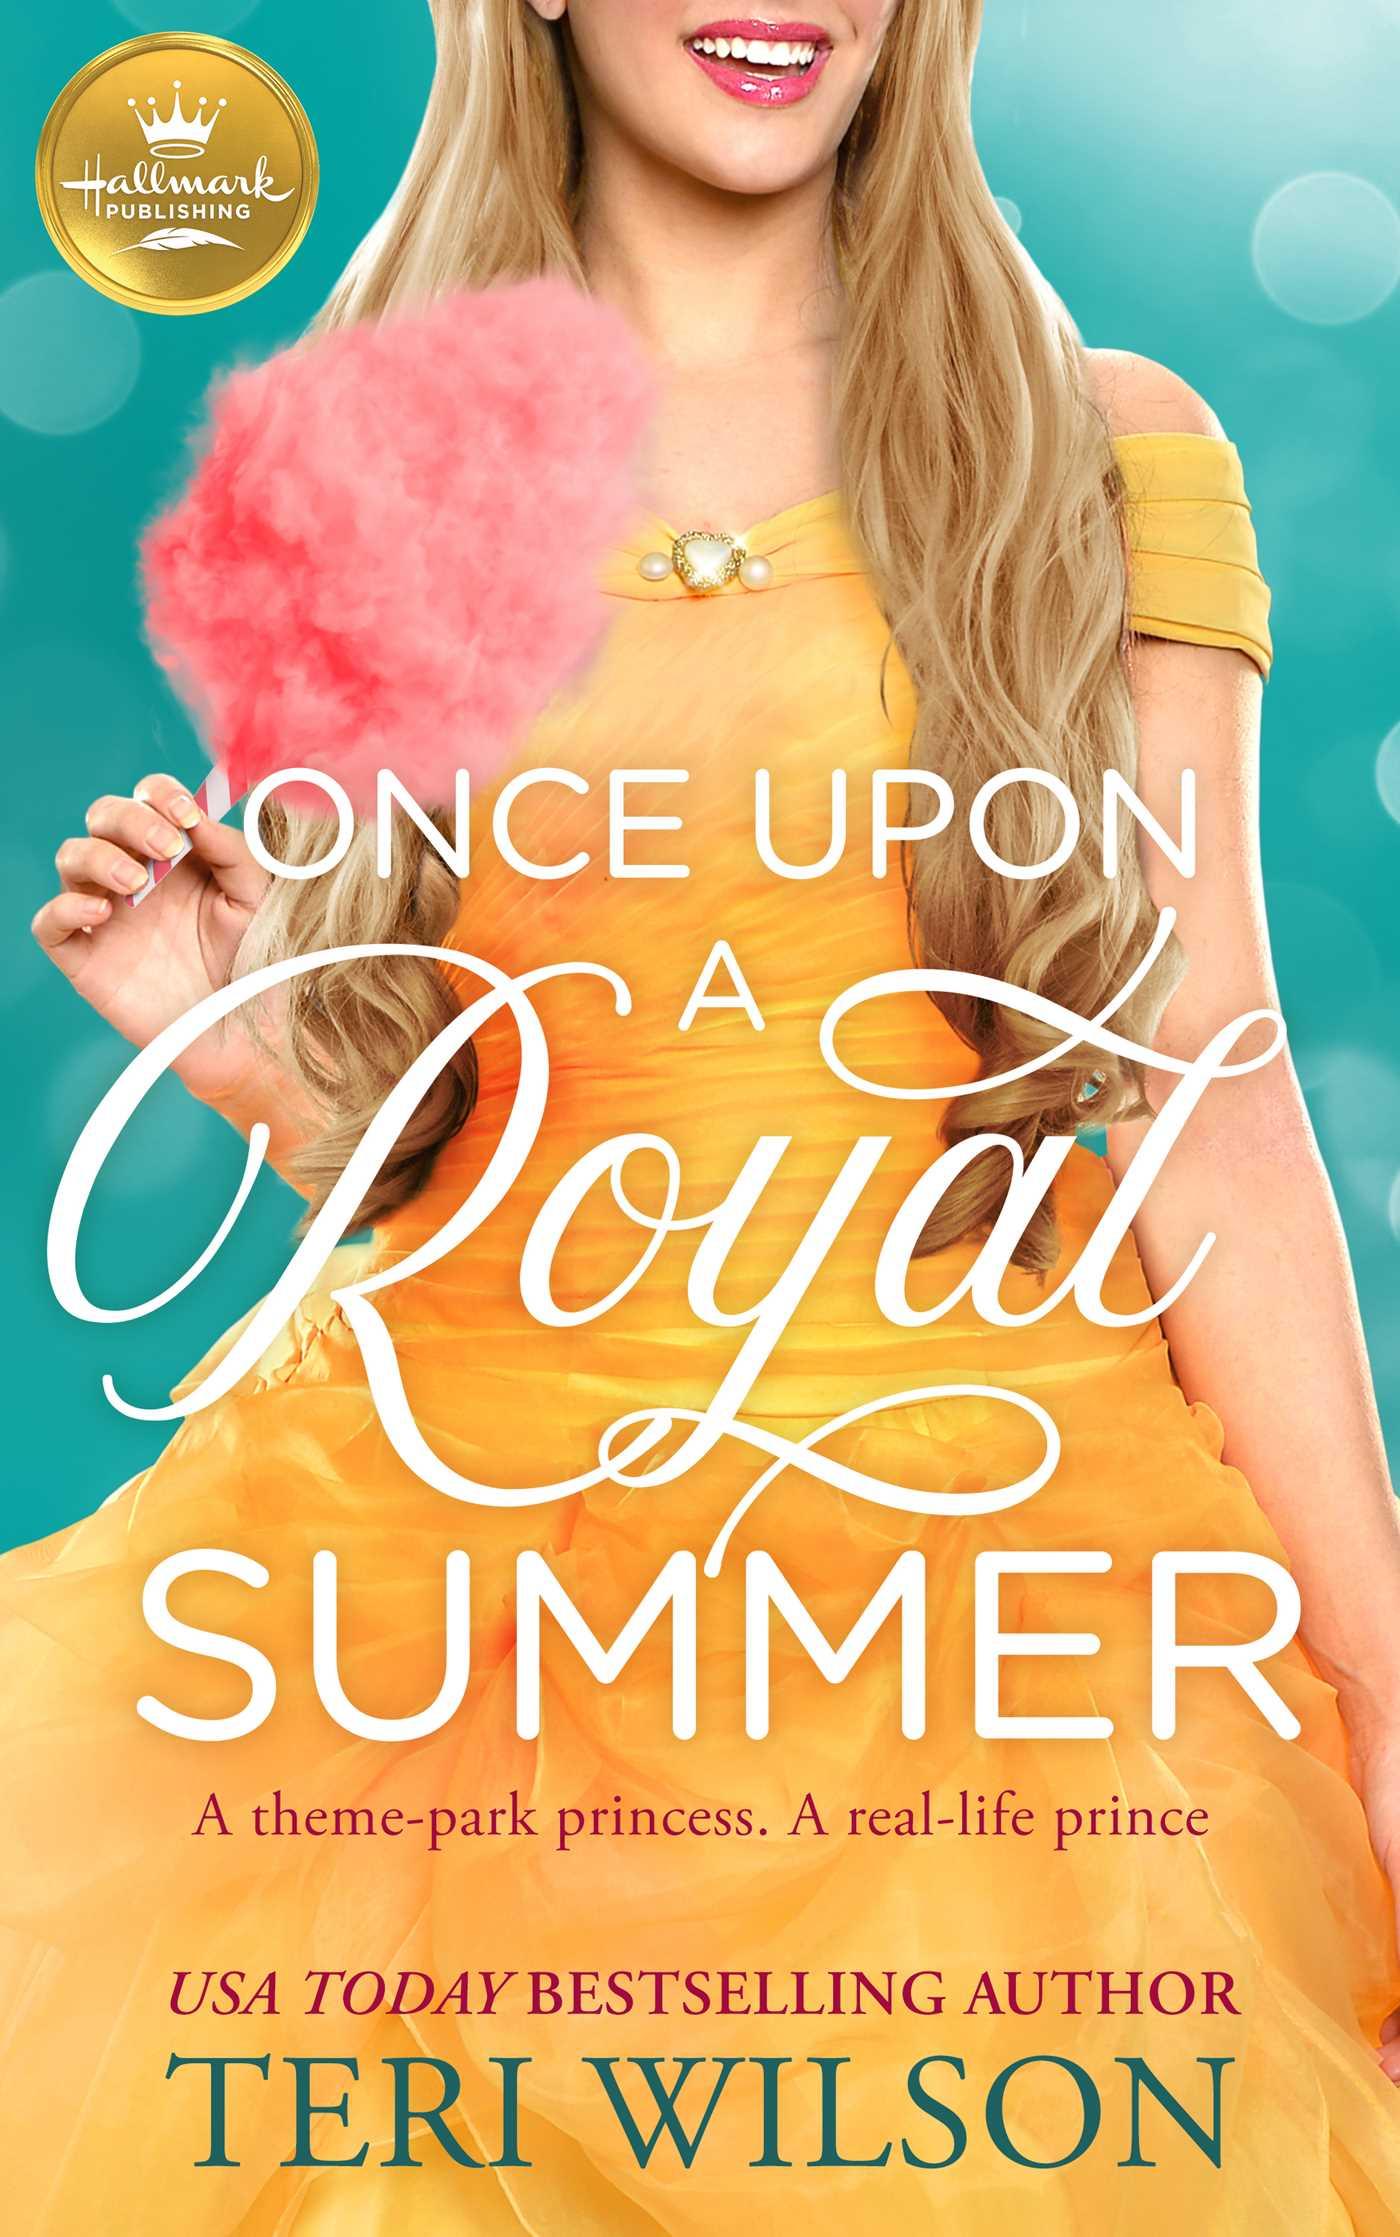 Once Upon a Royal Summer: A delightful royal romance from Hallmark Publishing, Teri Wilson, Dress, Yellow, Romance, Humour, Cute, Teri Wilson